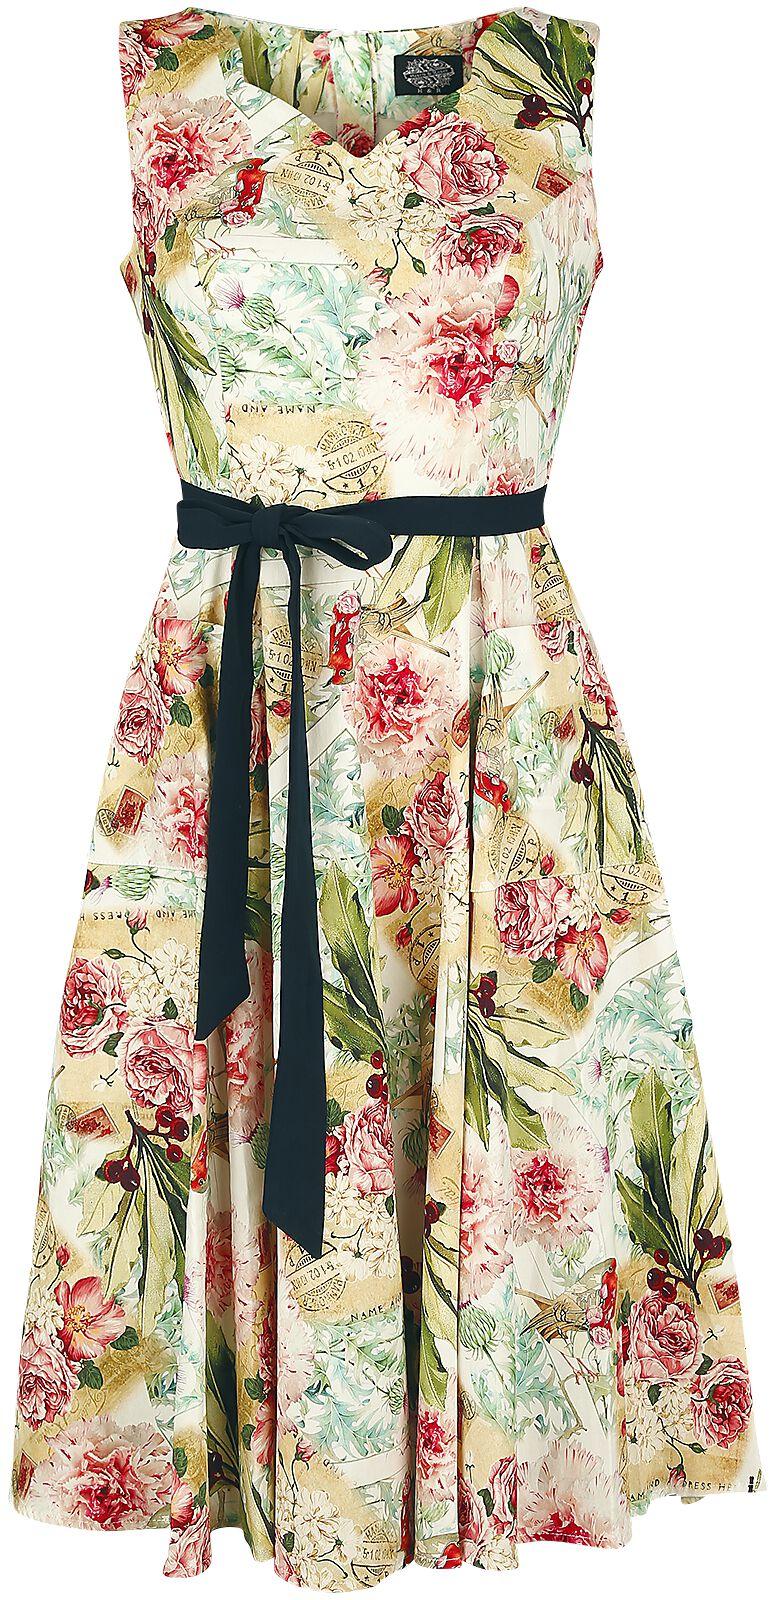 Kleider - H R London Warm Flower Swing Dress Mittellanges Kleid multicolor  - Onlineshop EMP